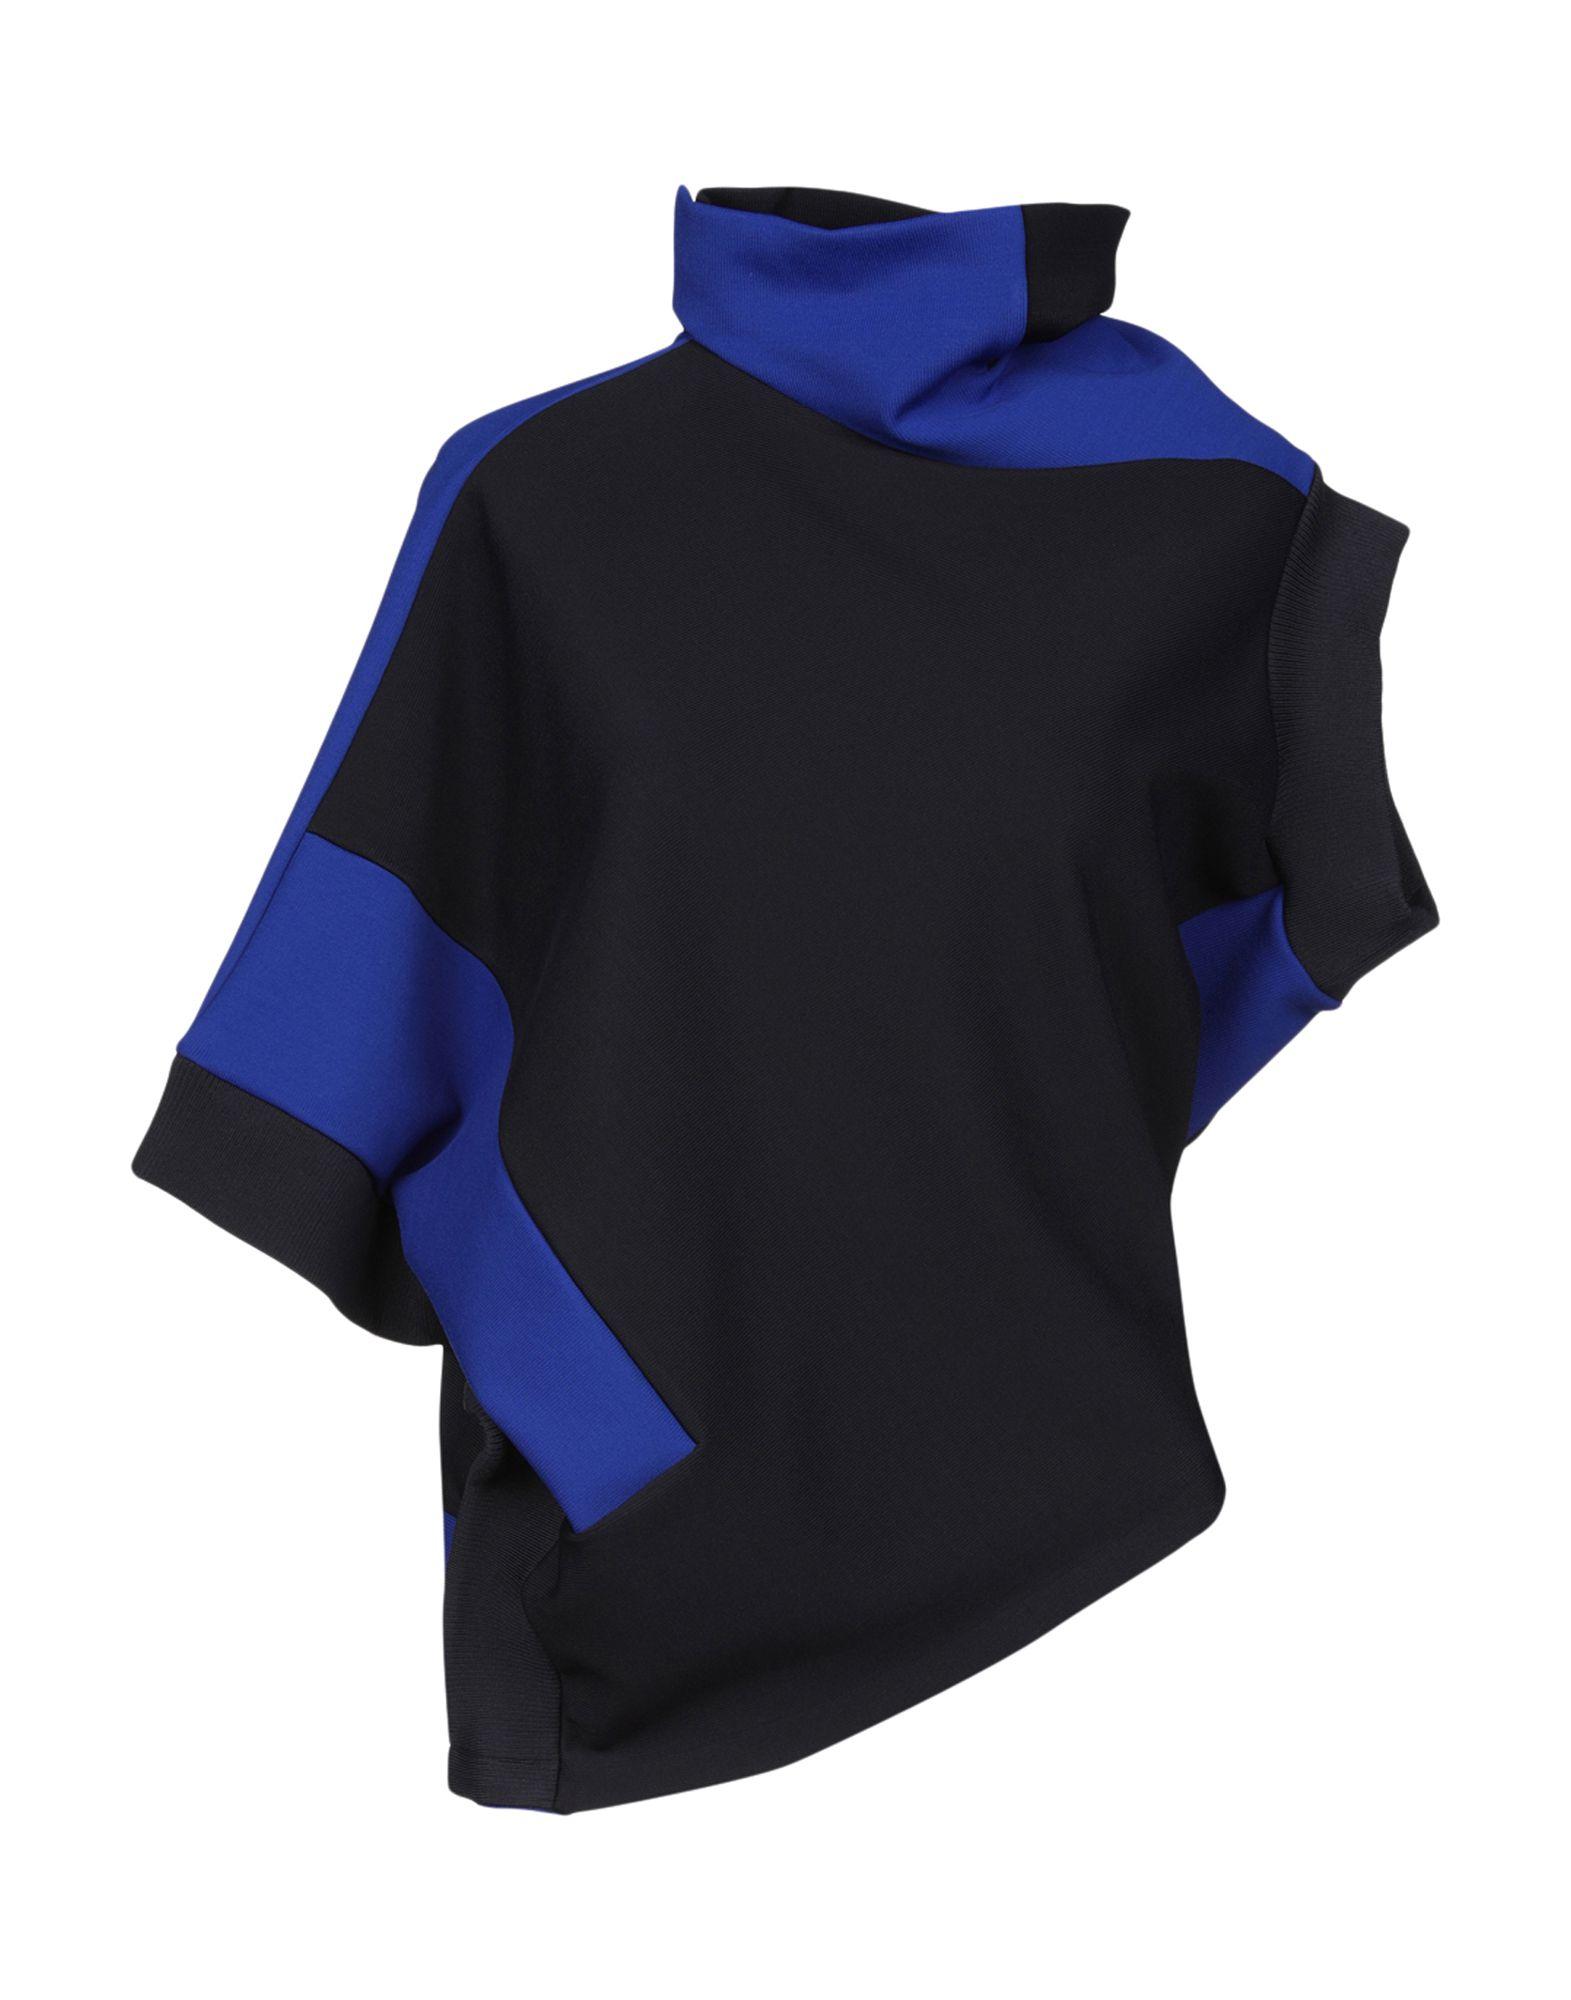 MAISON MARGIELA Sweatshirts. Jersey No appliqués Two-tone Turtleneck Short sleeves No pockets Stretch. 60% Viscose, 31% Polyamide, 9% Elastane